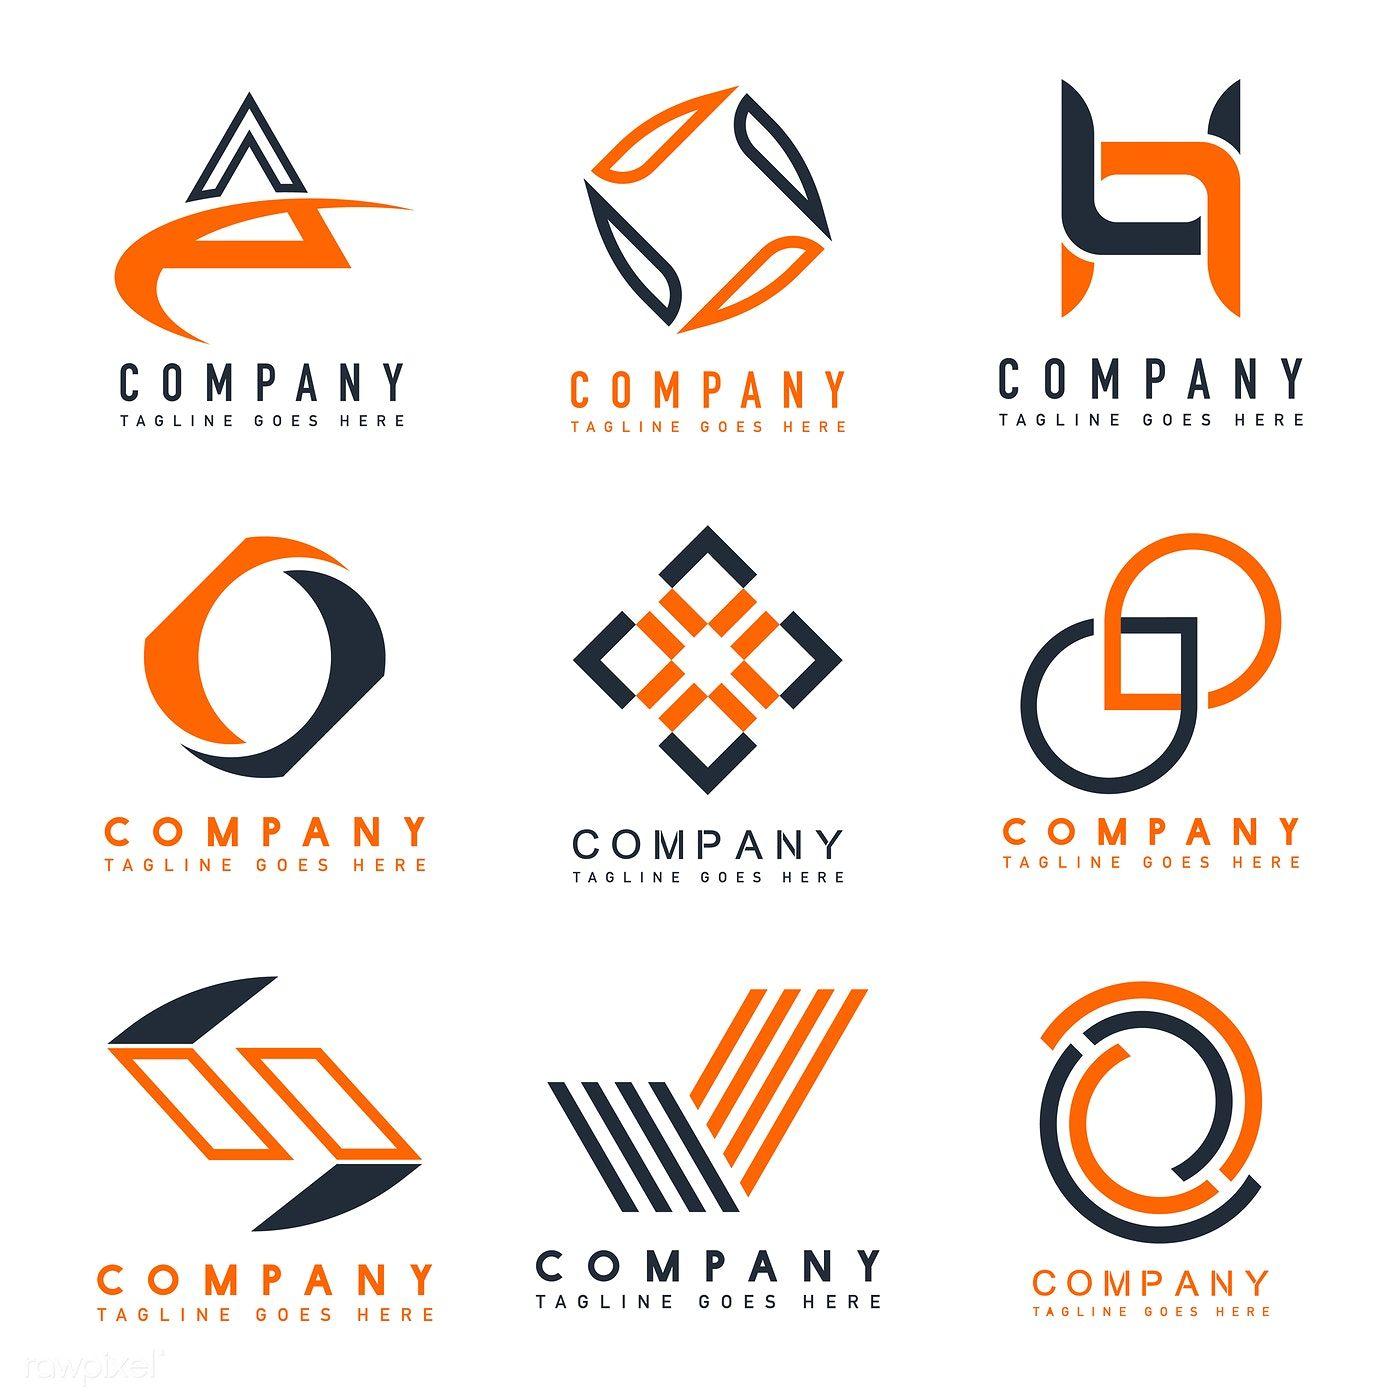 Download premium illustration of Set of company logo